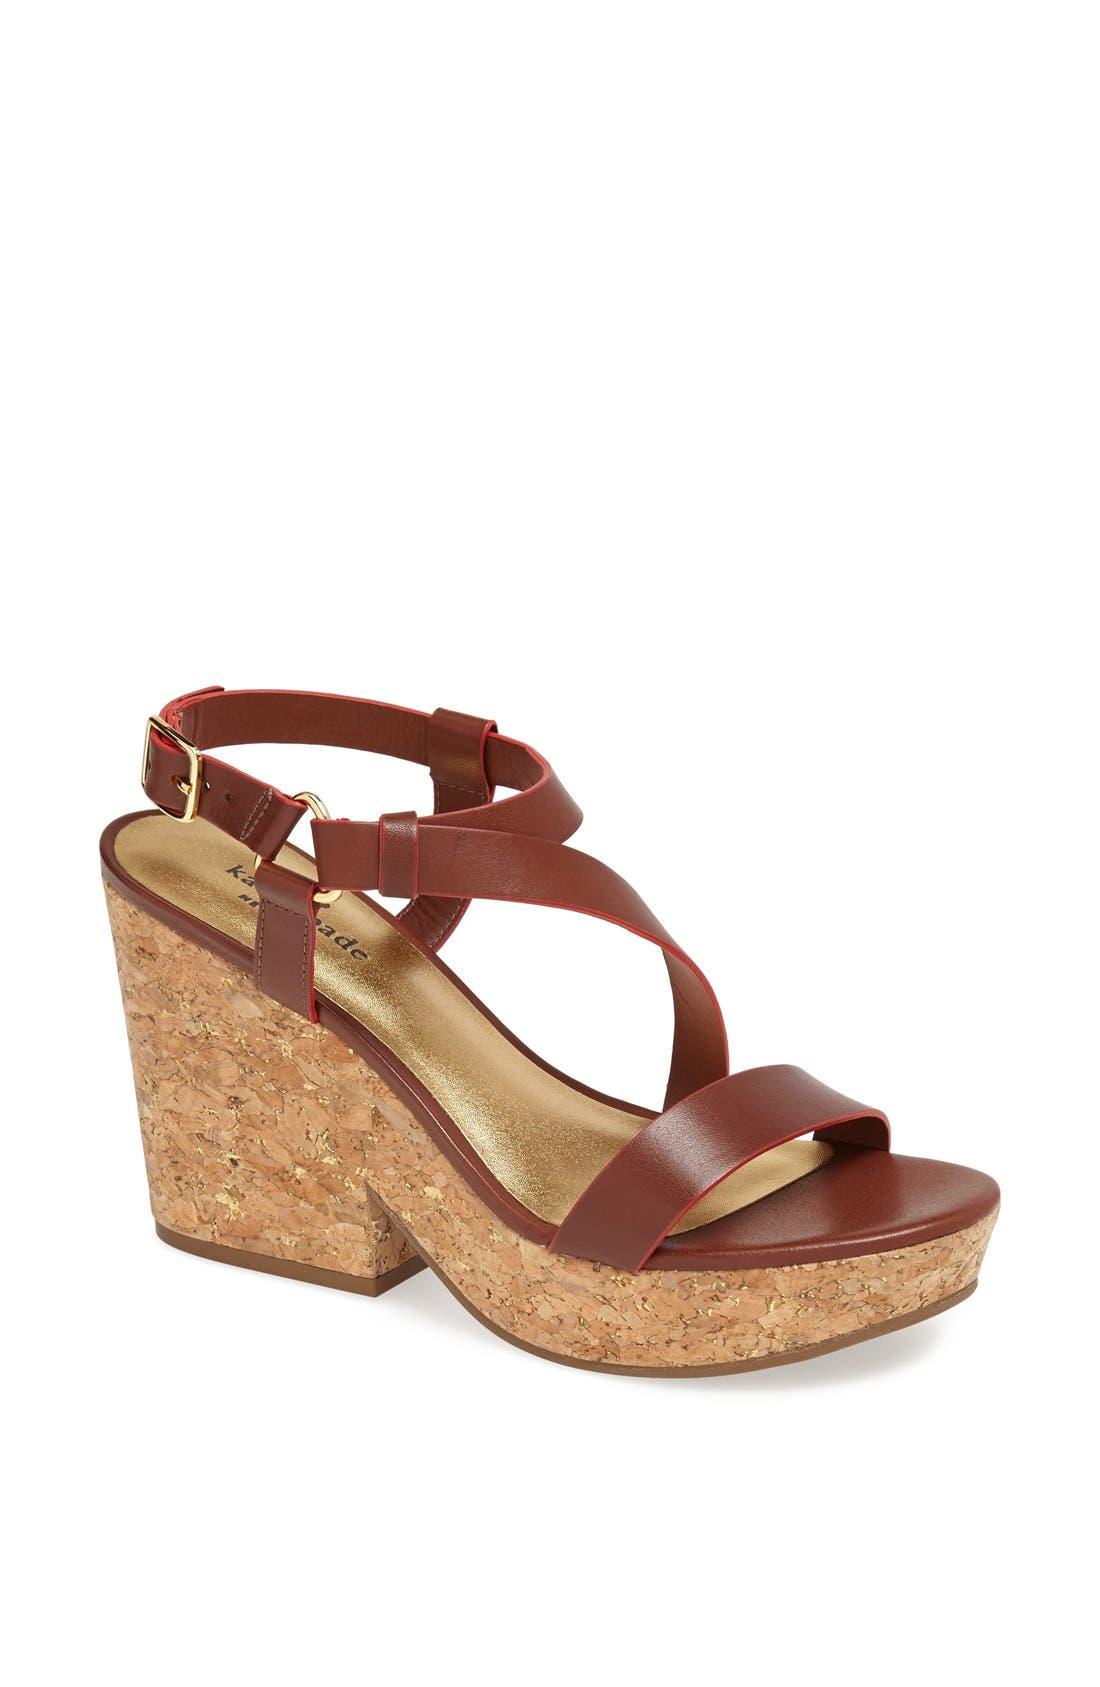 Main Image - kate spade new york 'viex' wedge sandal